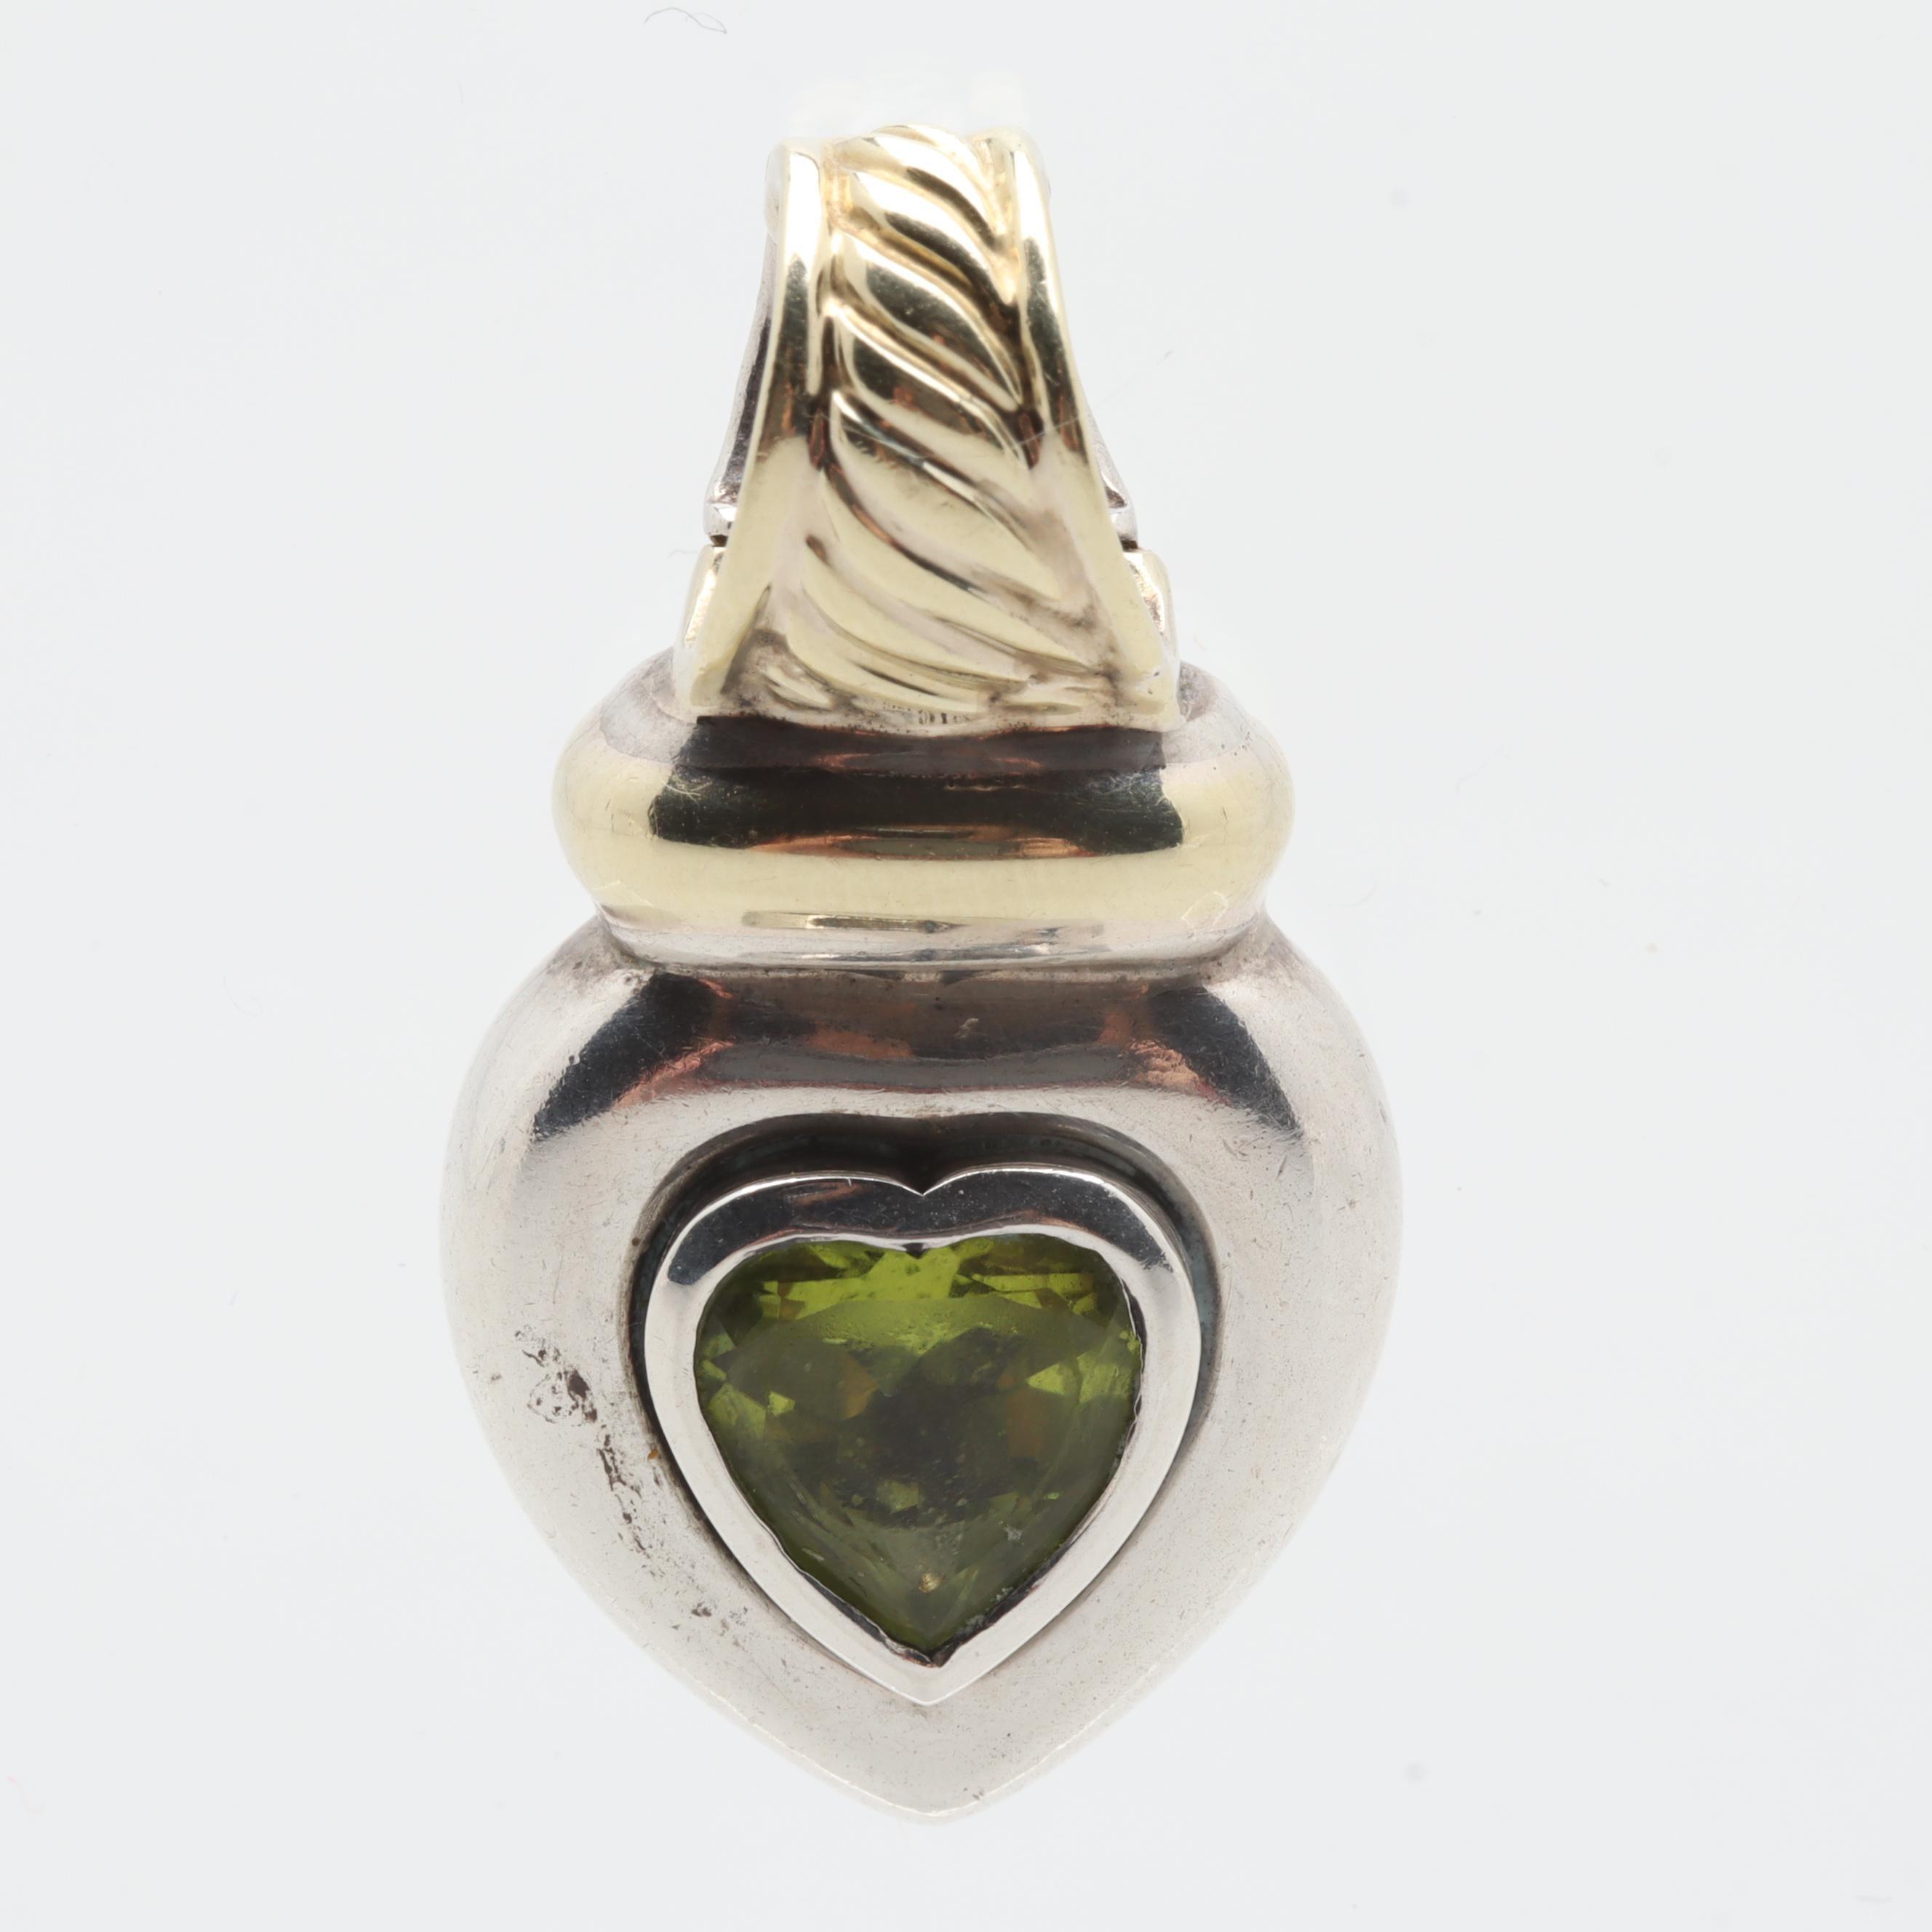 David Yurman Sterling Silver Peridot Heart Pendant with 14K Yellow Gold Accents